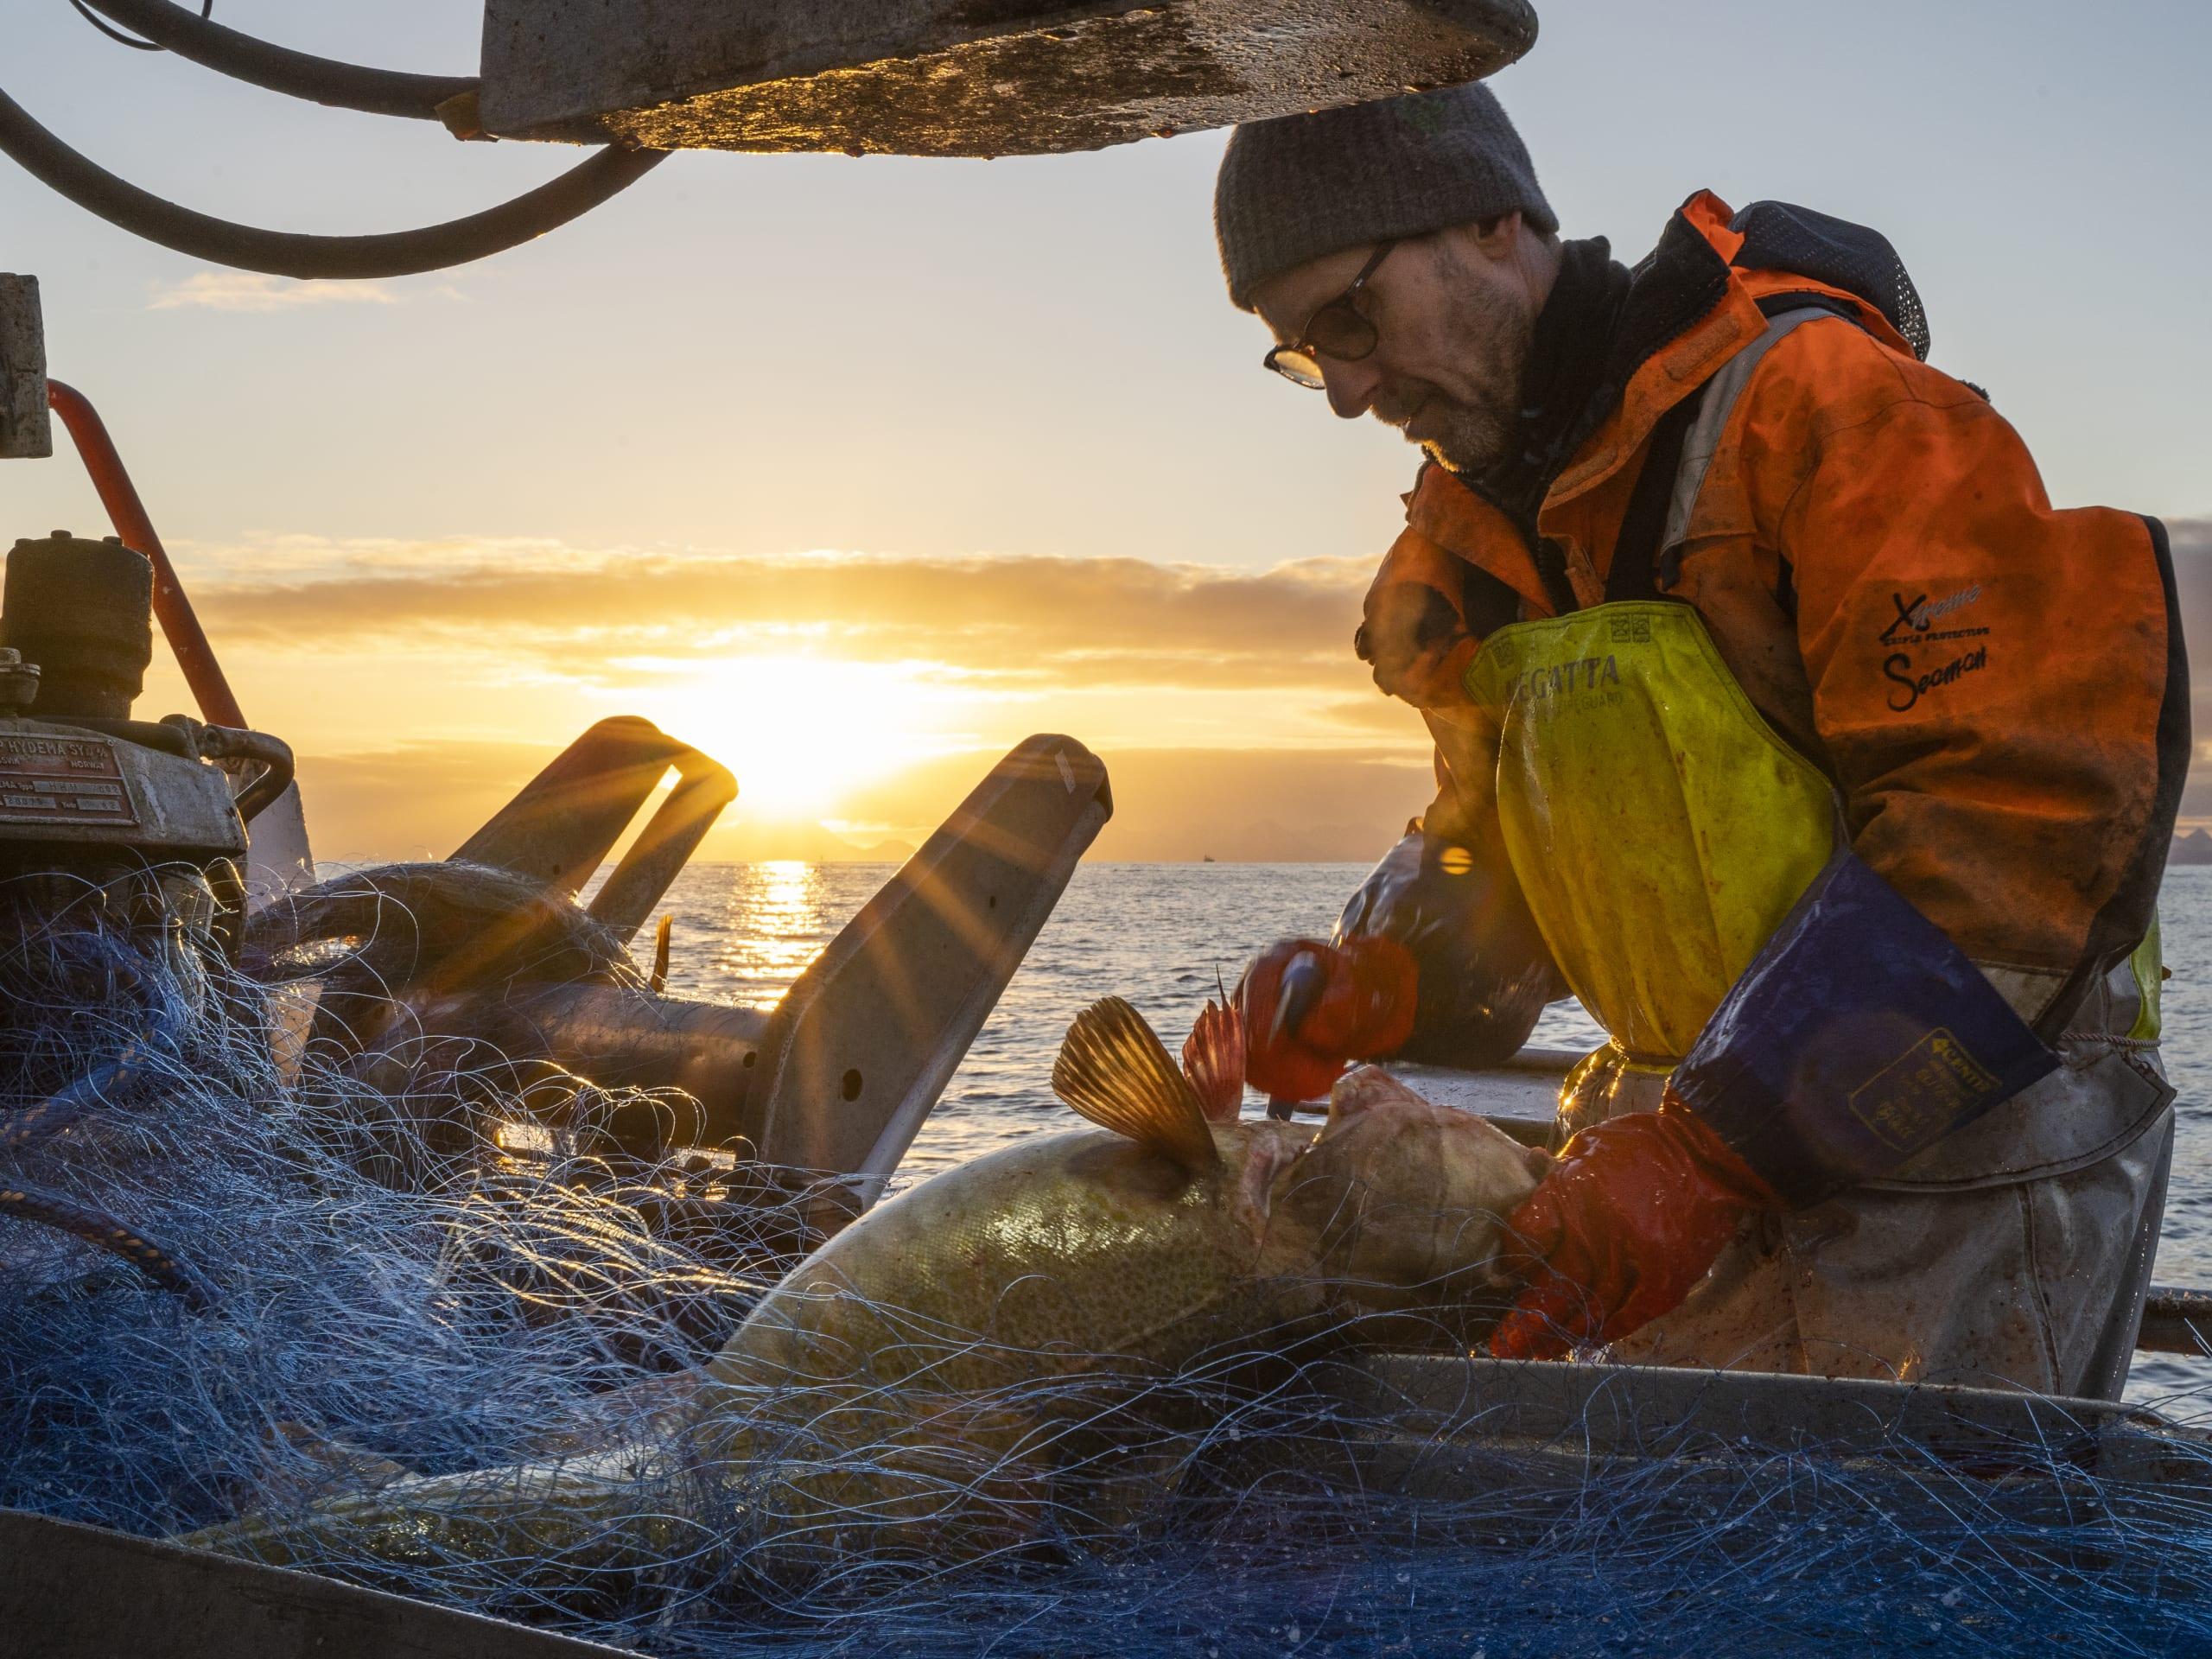 Fishermen gutting Arctic cod in Lofoten